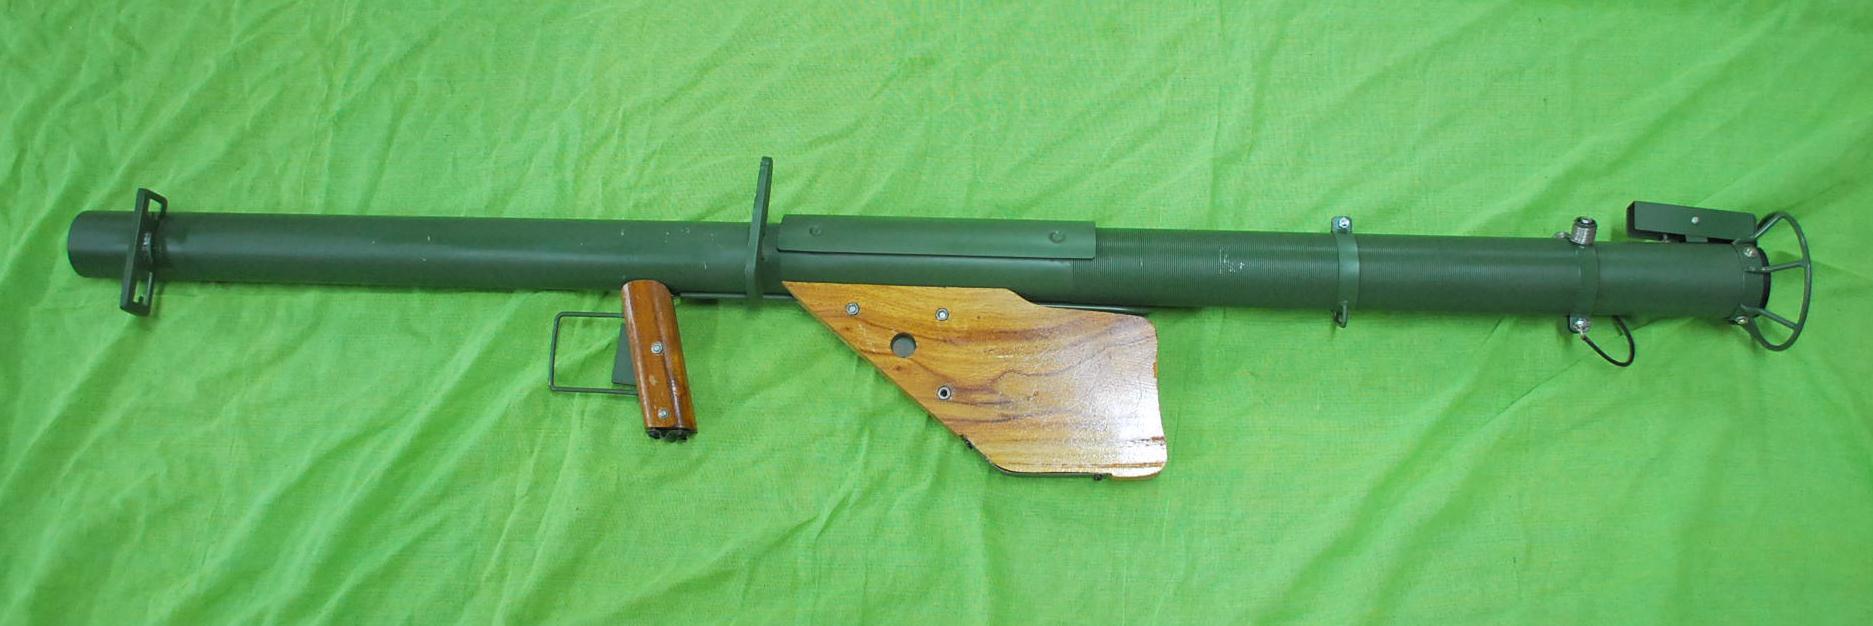 M1 バズーカ砲